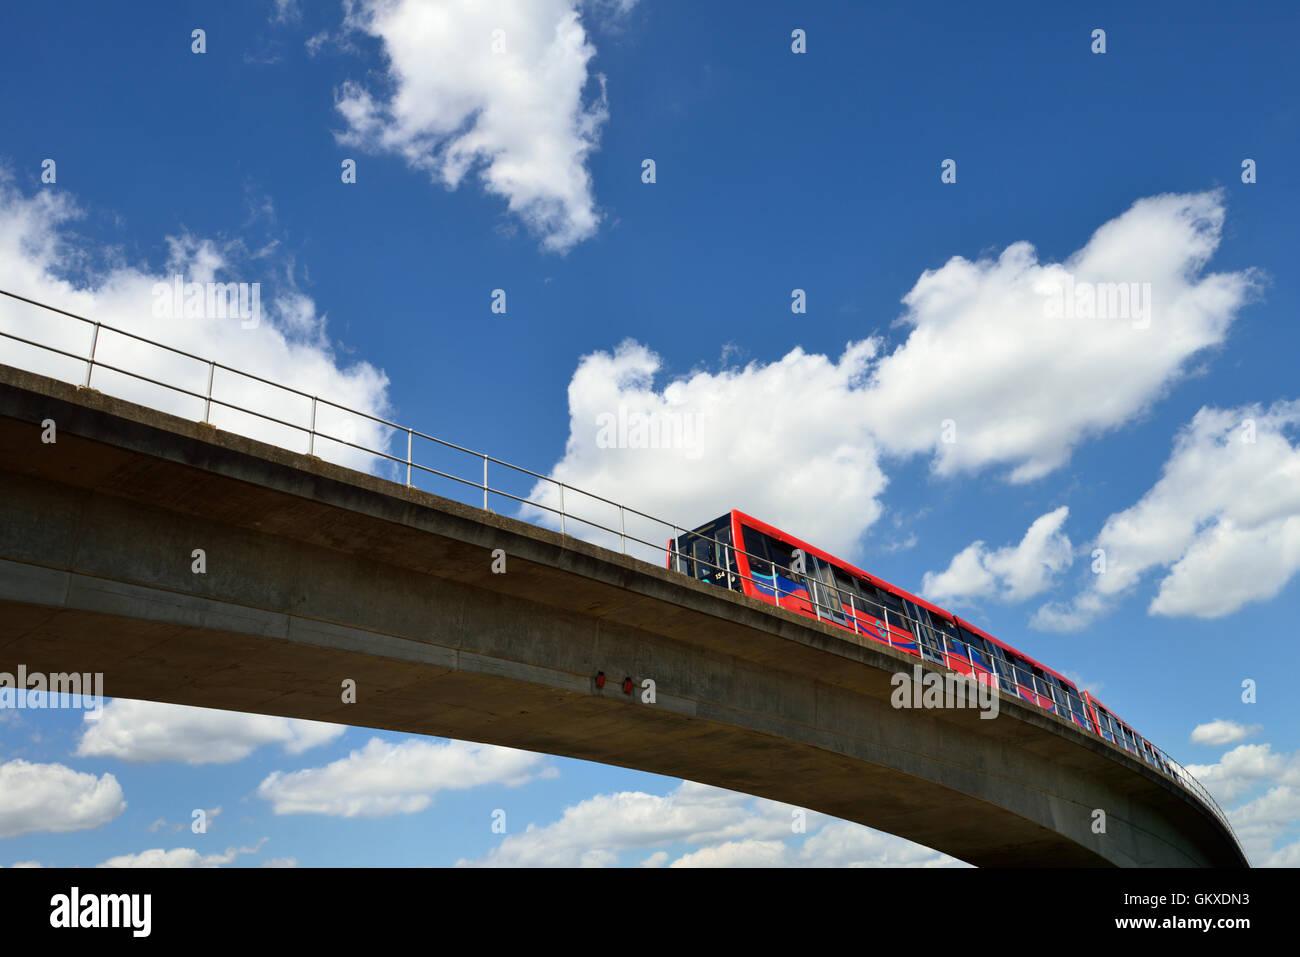 Docklands Light Railway, East London, United Kingdom - Stock Image